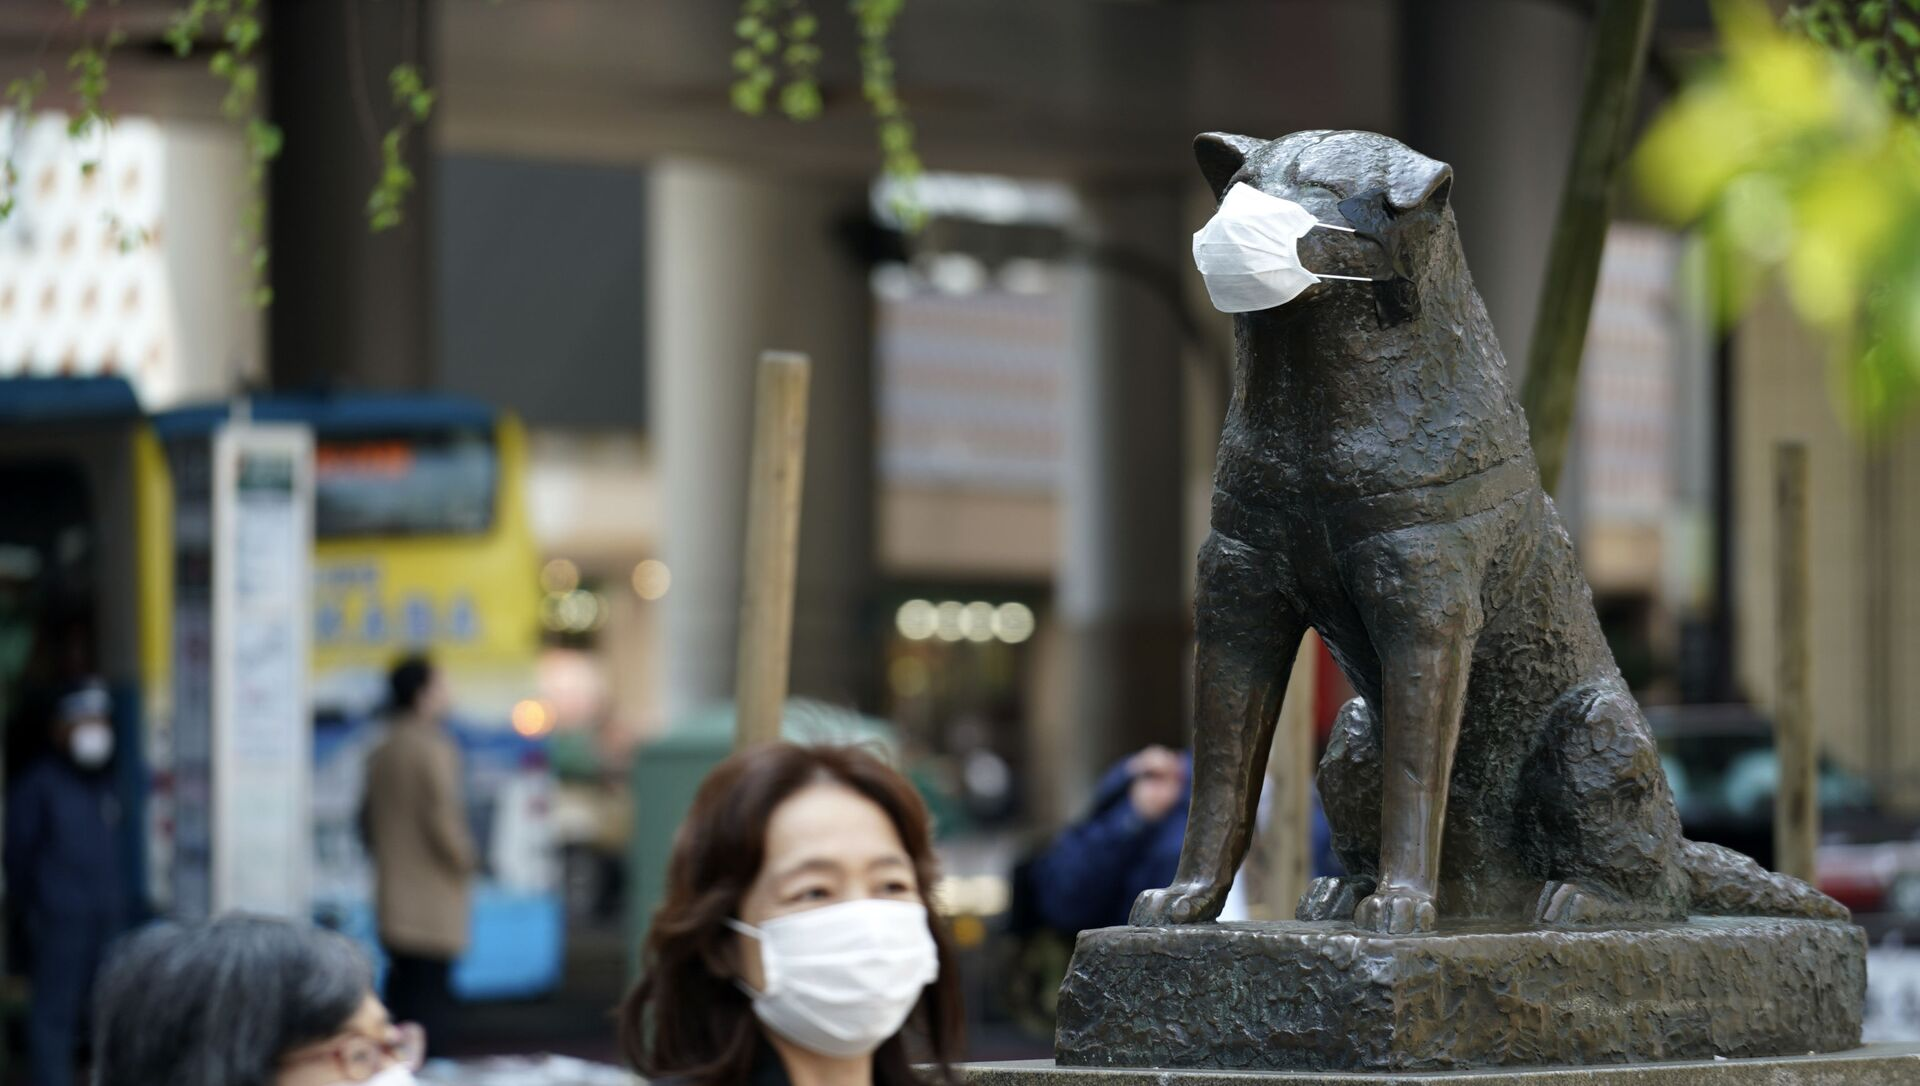 Pomnik psa Hatiko, Tokio, Japonia - Sputnik Polska, 1920, 07.03.2021